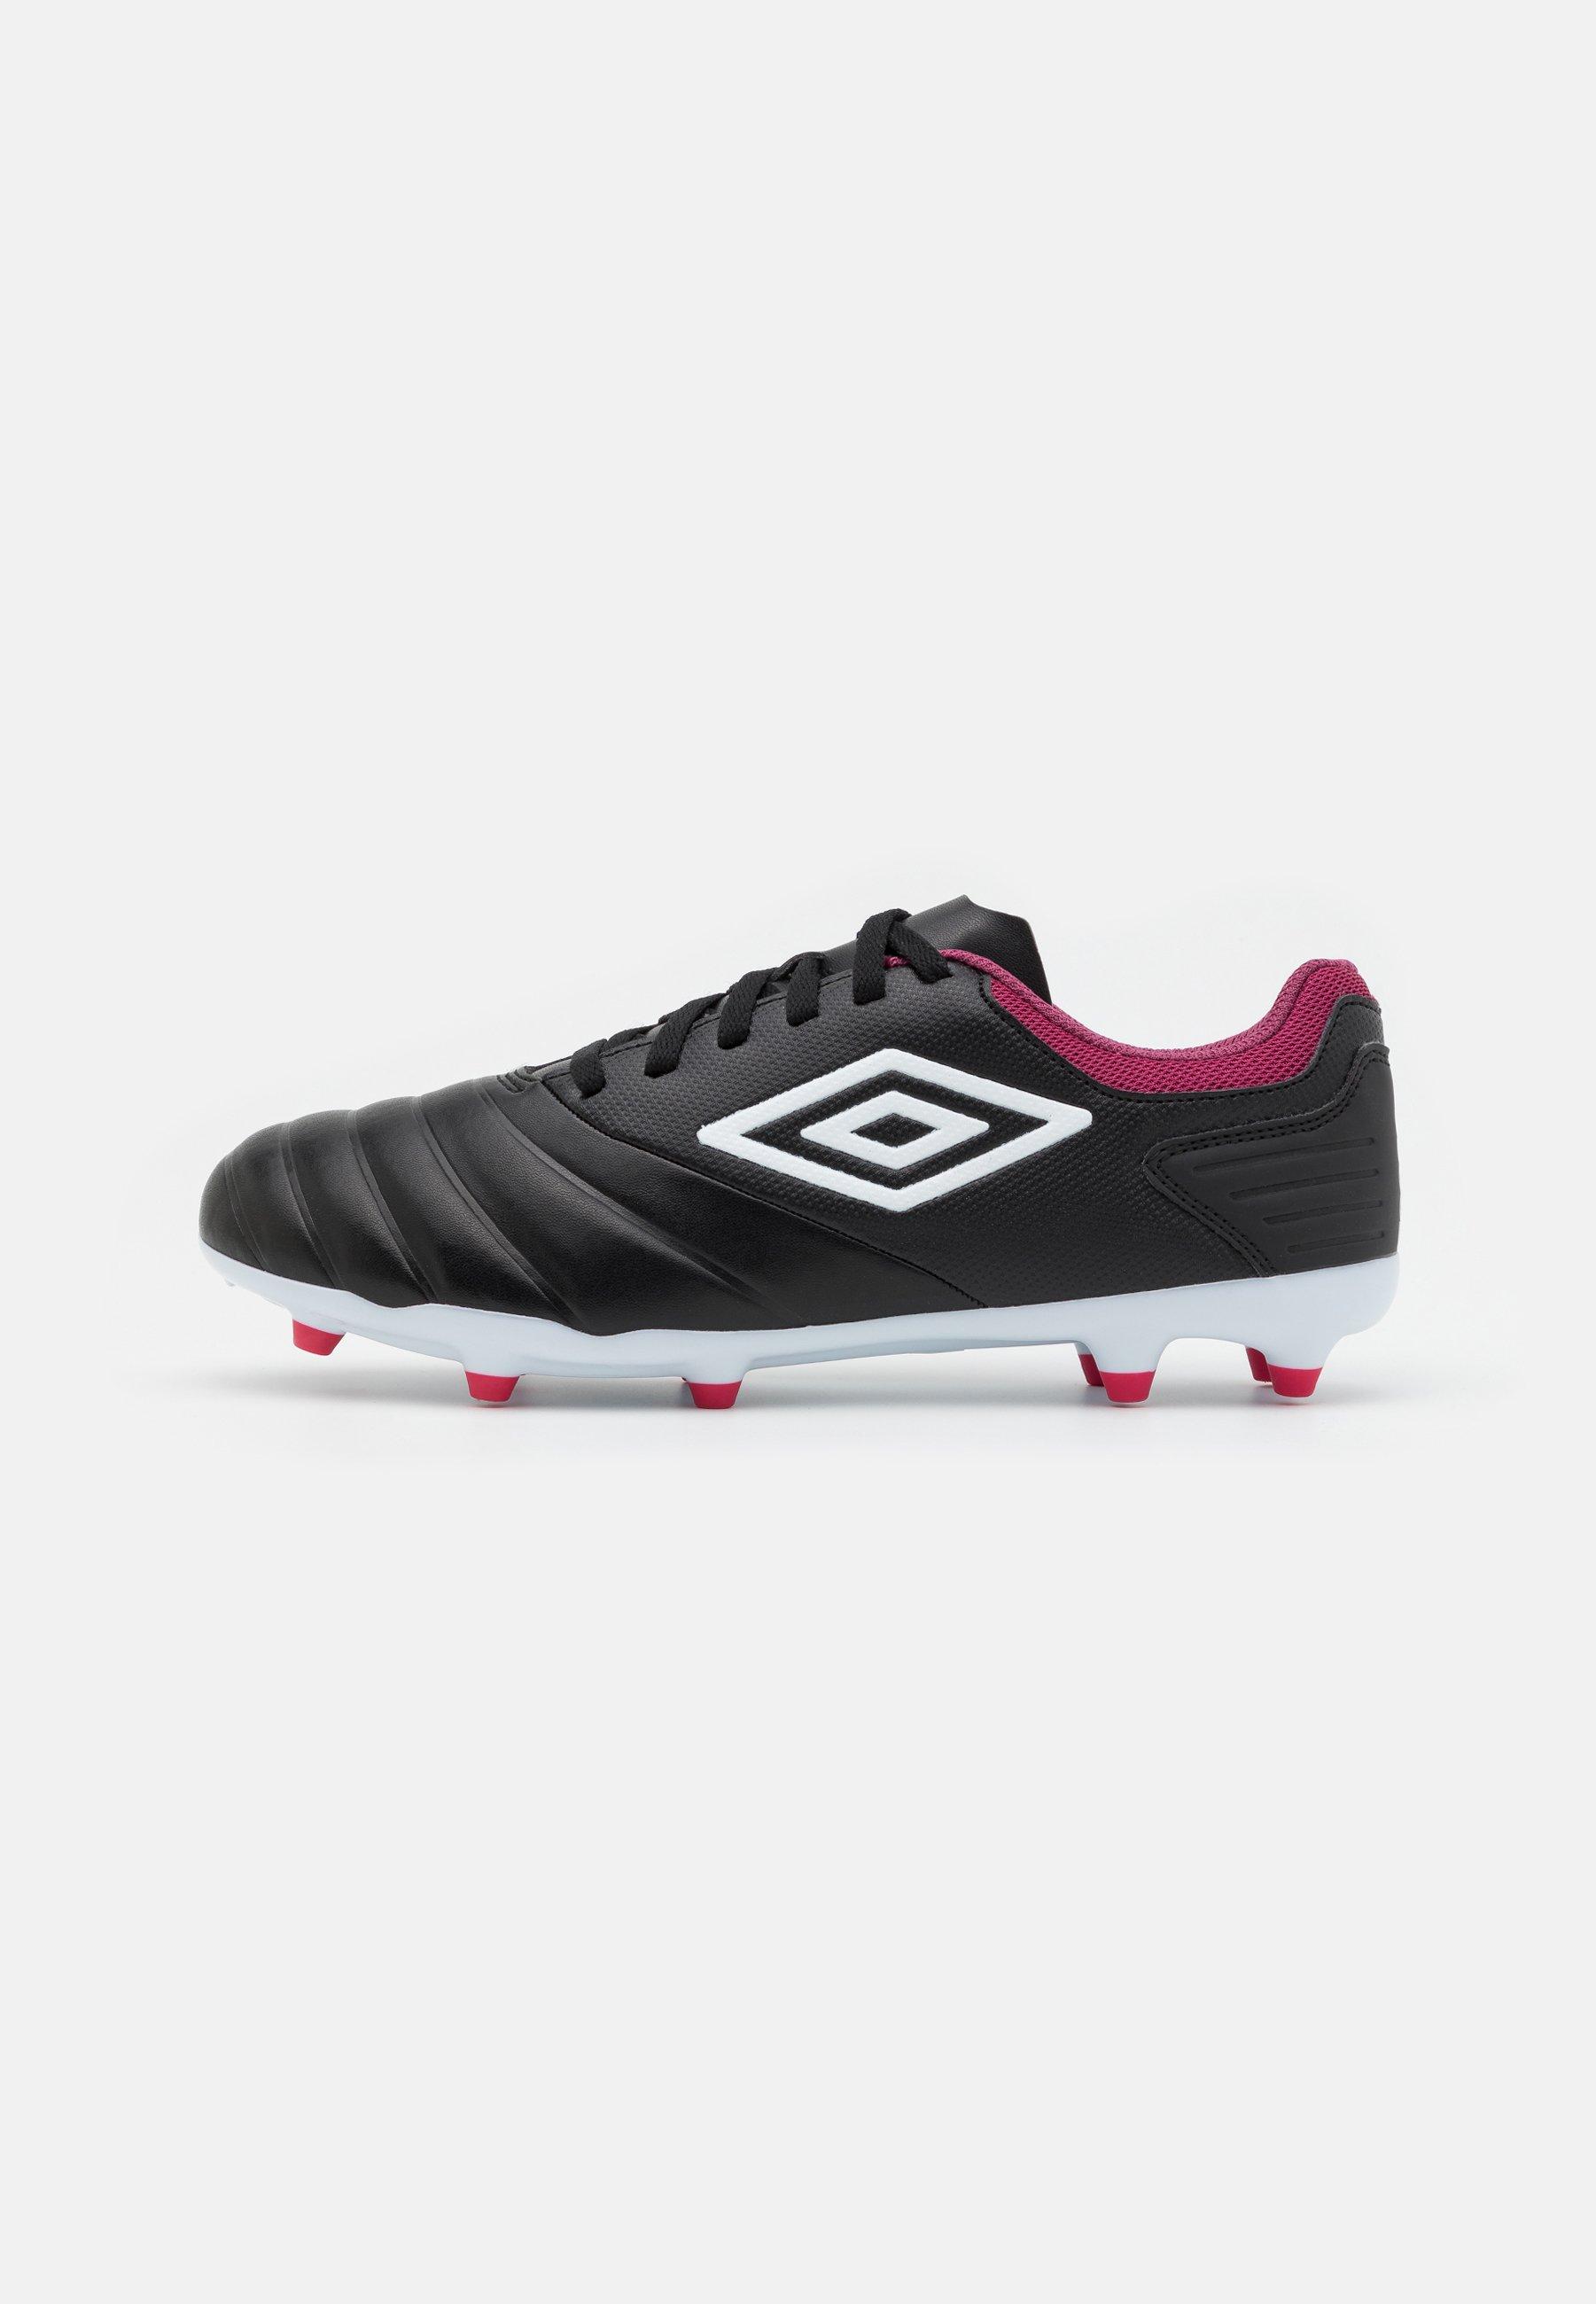 Homme TOCCO CLUB FG - Chaussures de foot à crampons